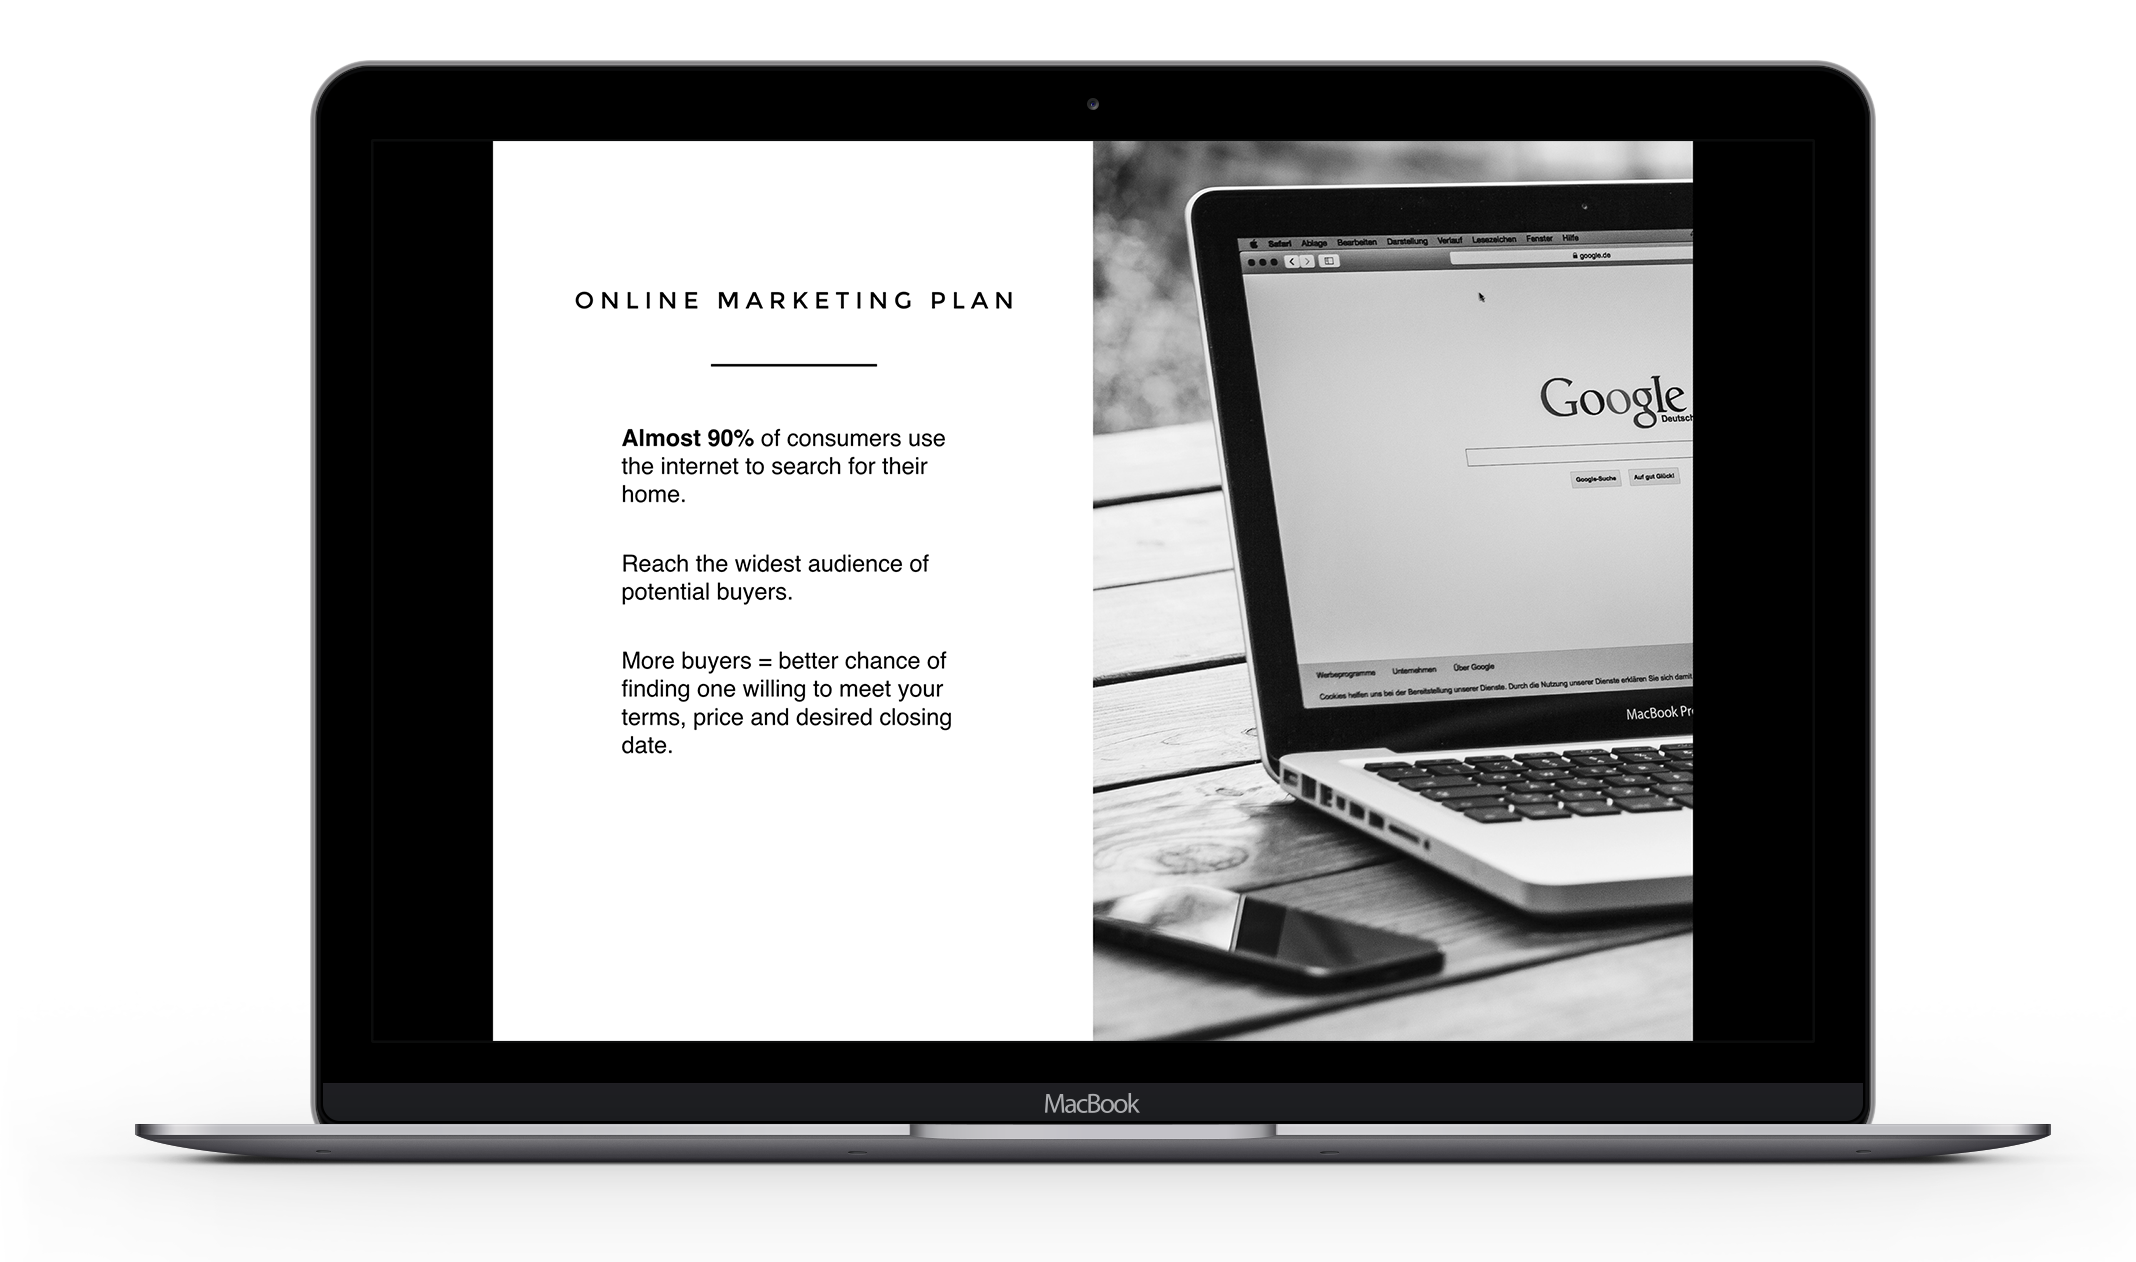 Nick-Presentation-2-Macbook-Mockup.png